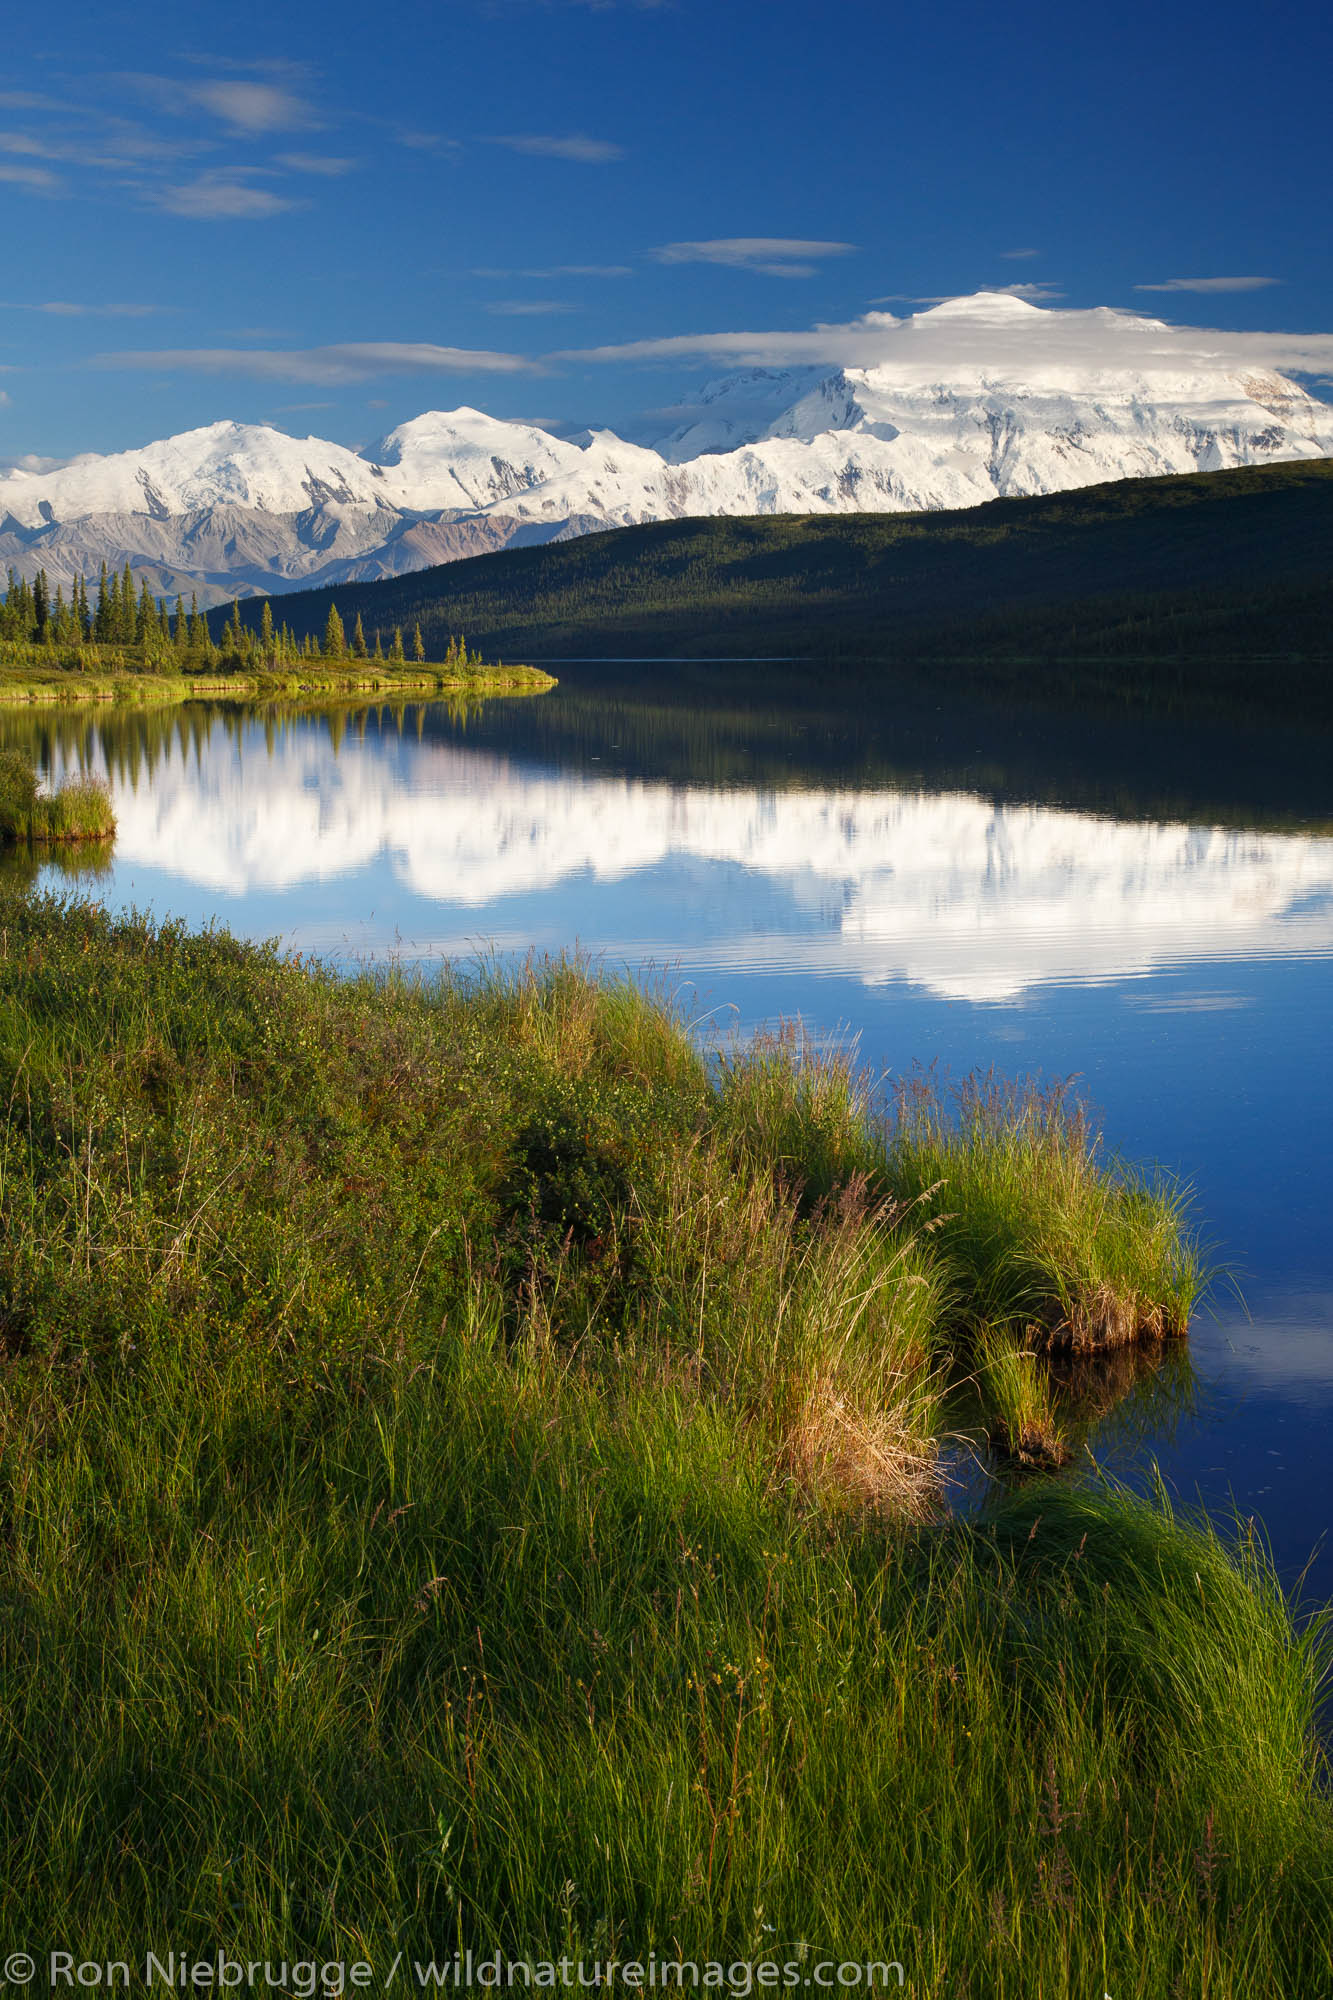 Mt. McKinley, also known as Denali, from Wonder Lake, Denali National Park, Alaska.